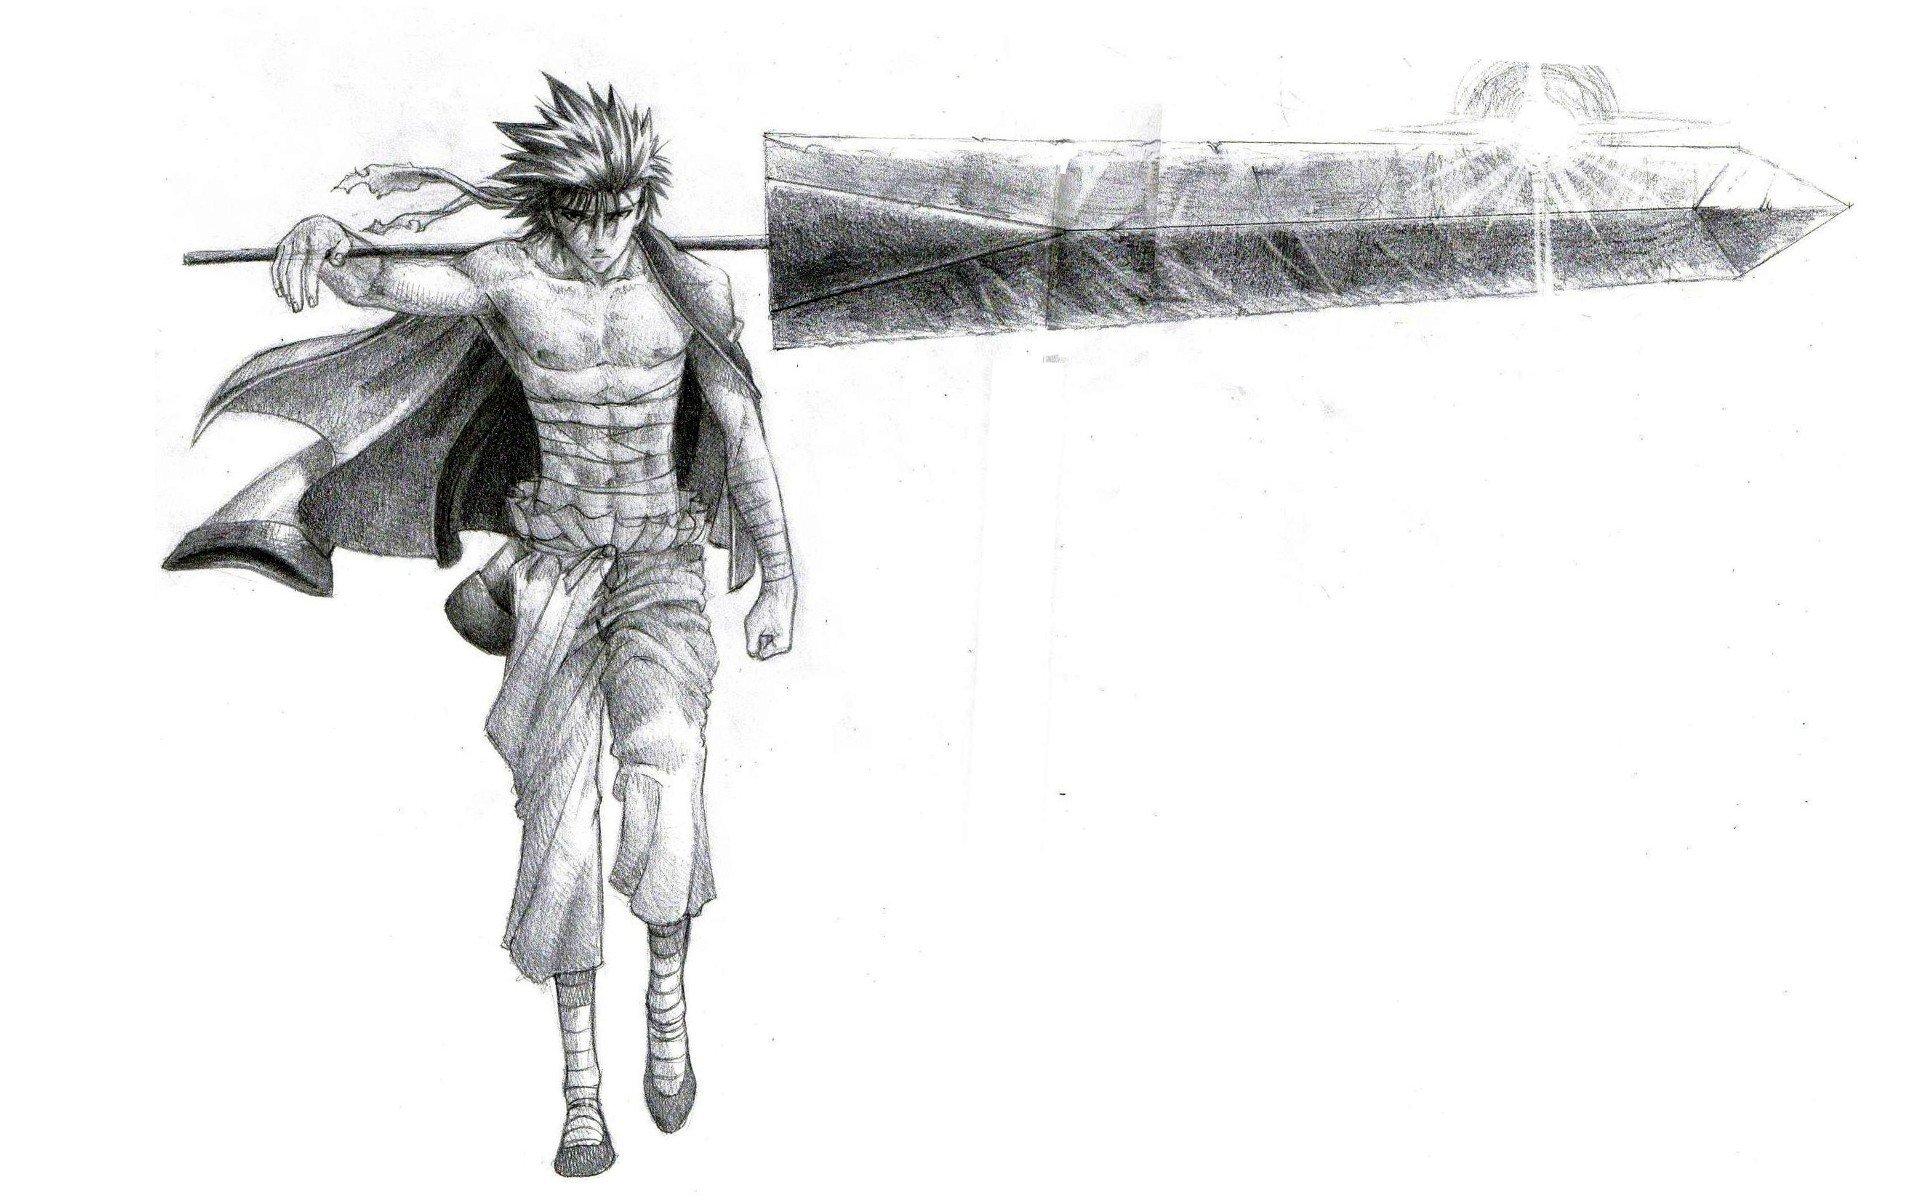 Rurouni Kenshin Drawings Simple Background Sanoskue Wallpaper